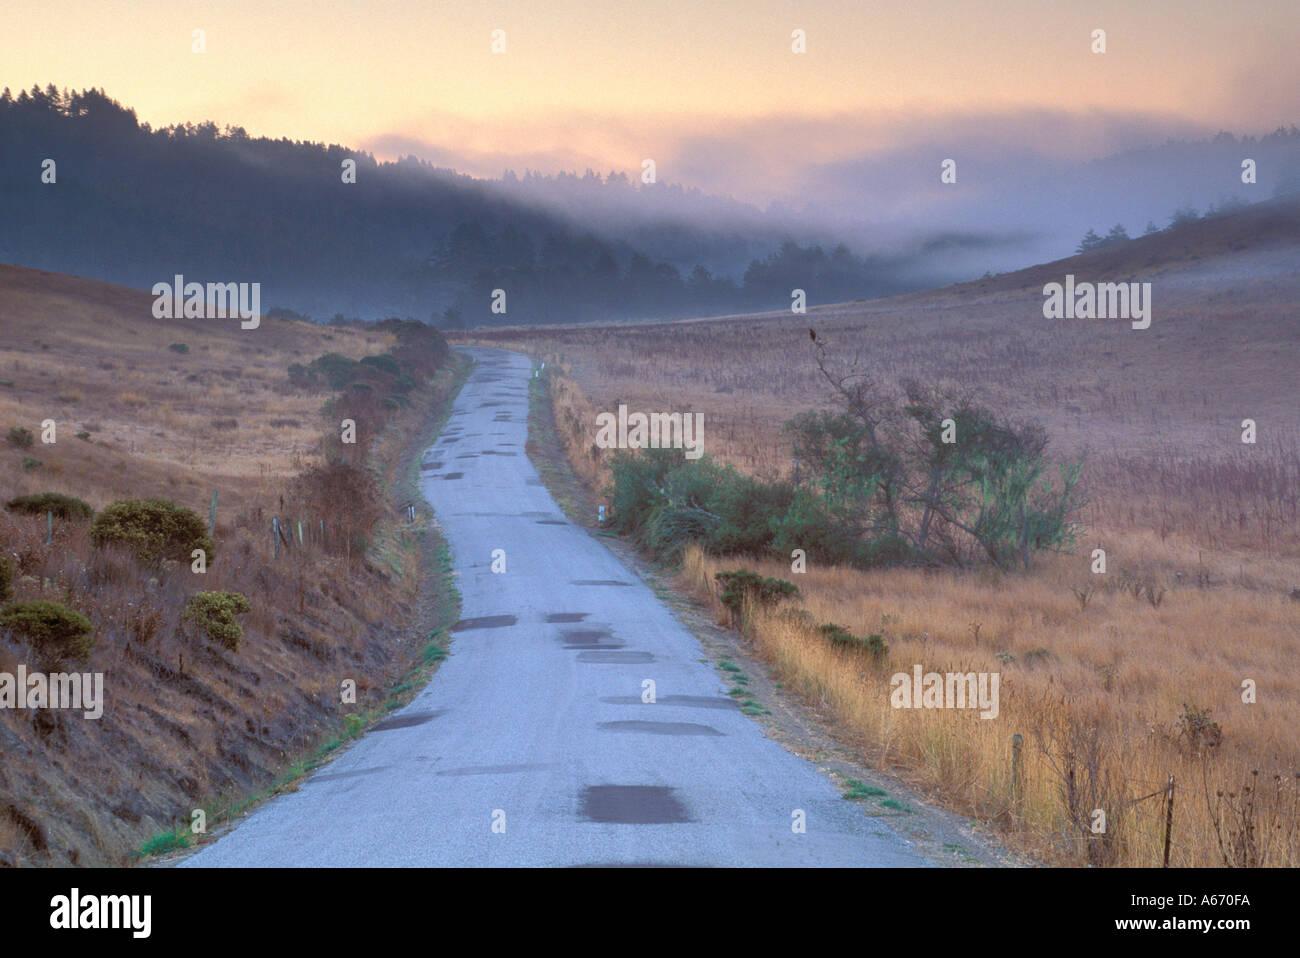 California san mateo county pescadero - Morning Light Over Rural Road Near Pescadero San Mateo County California